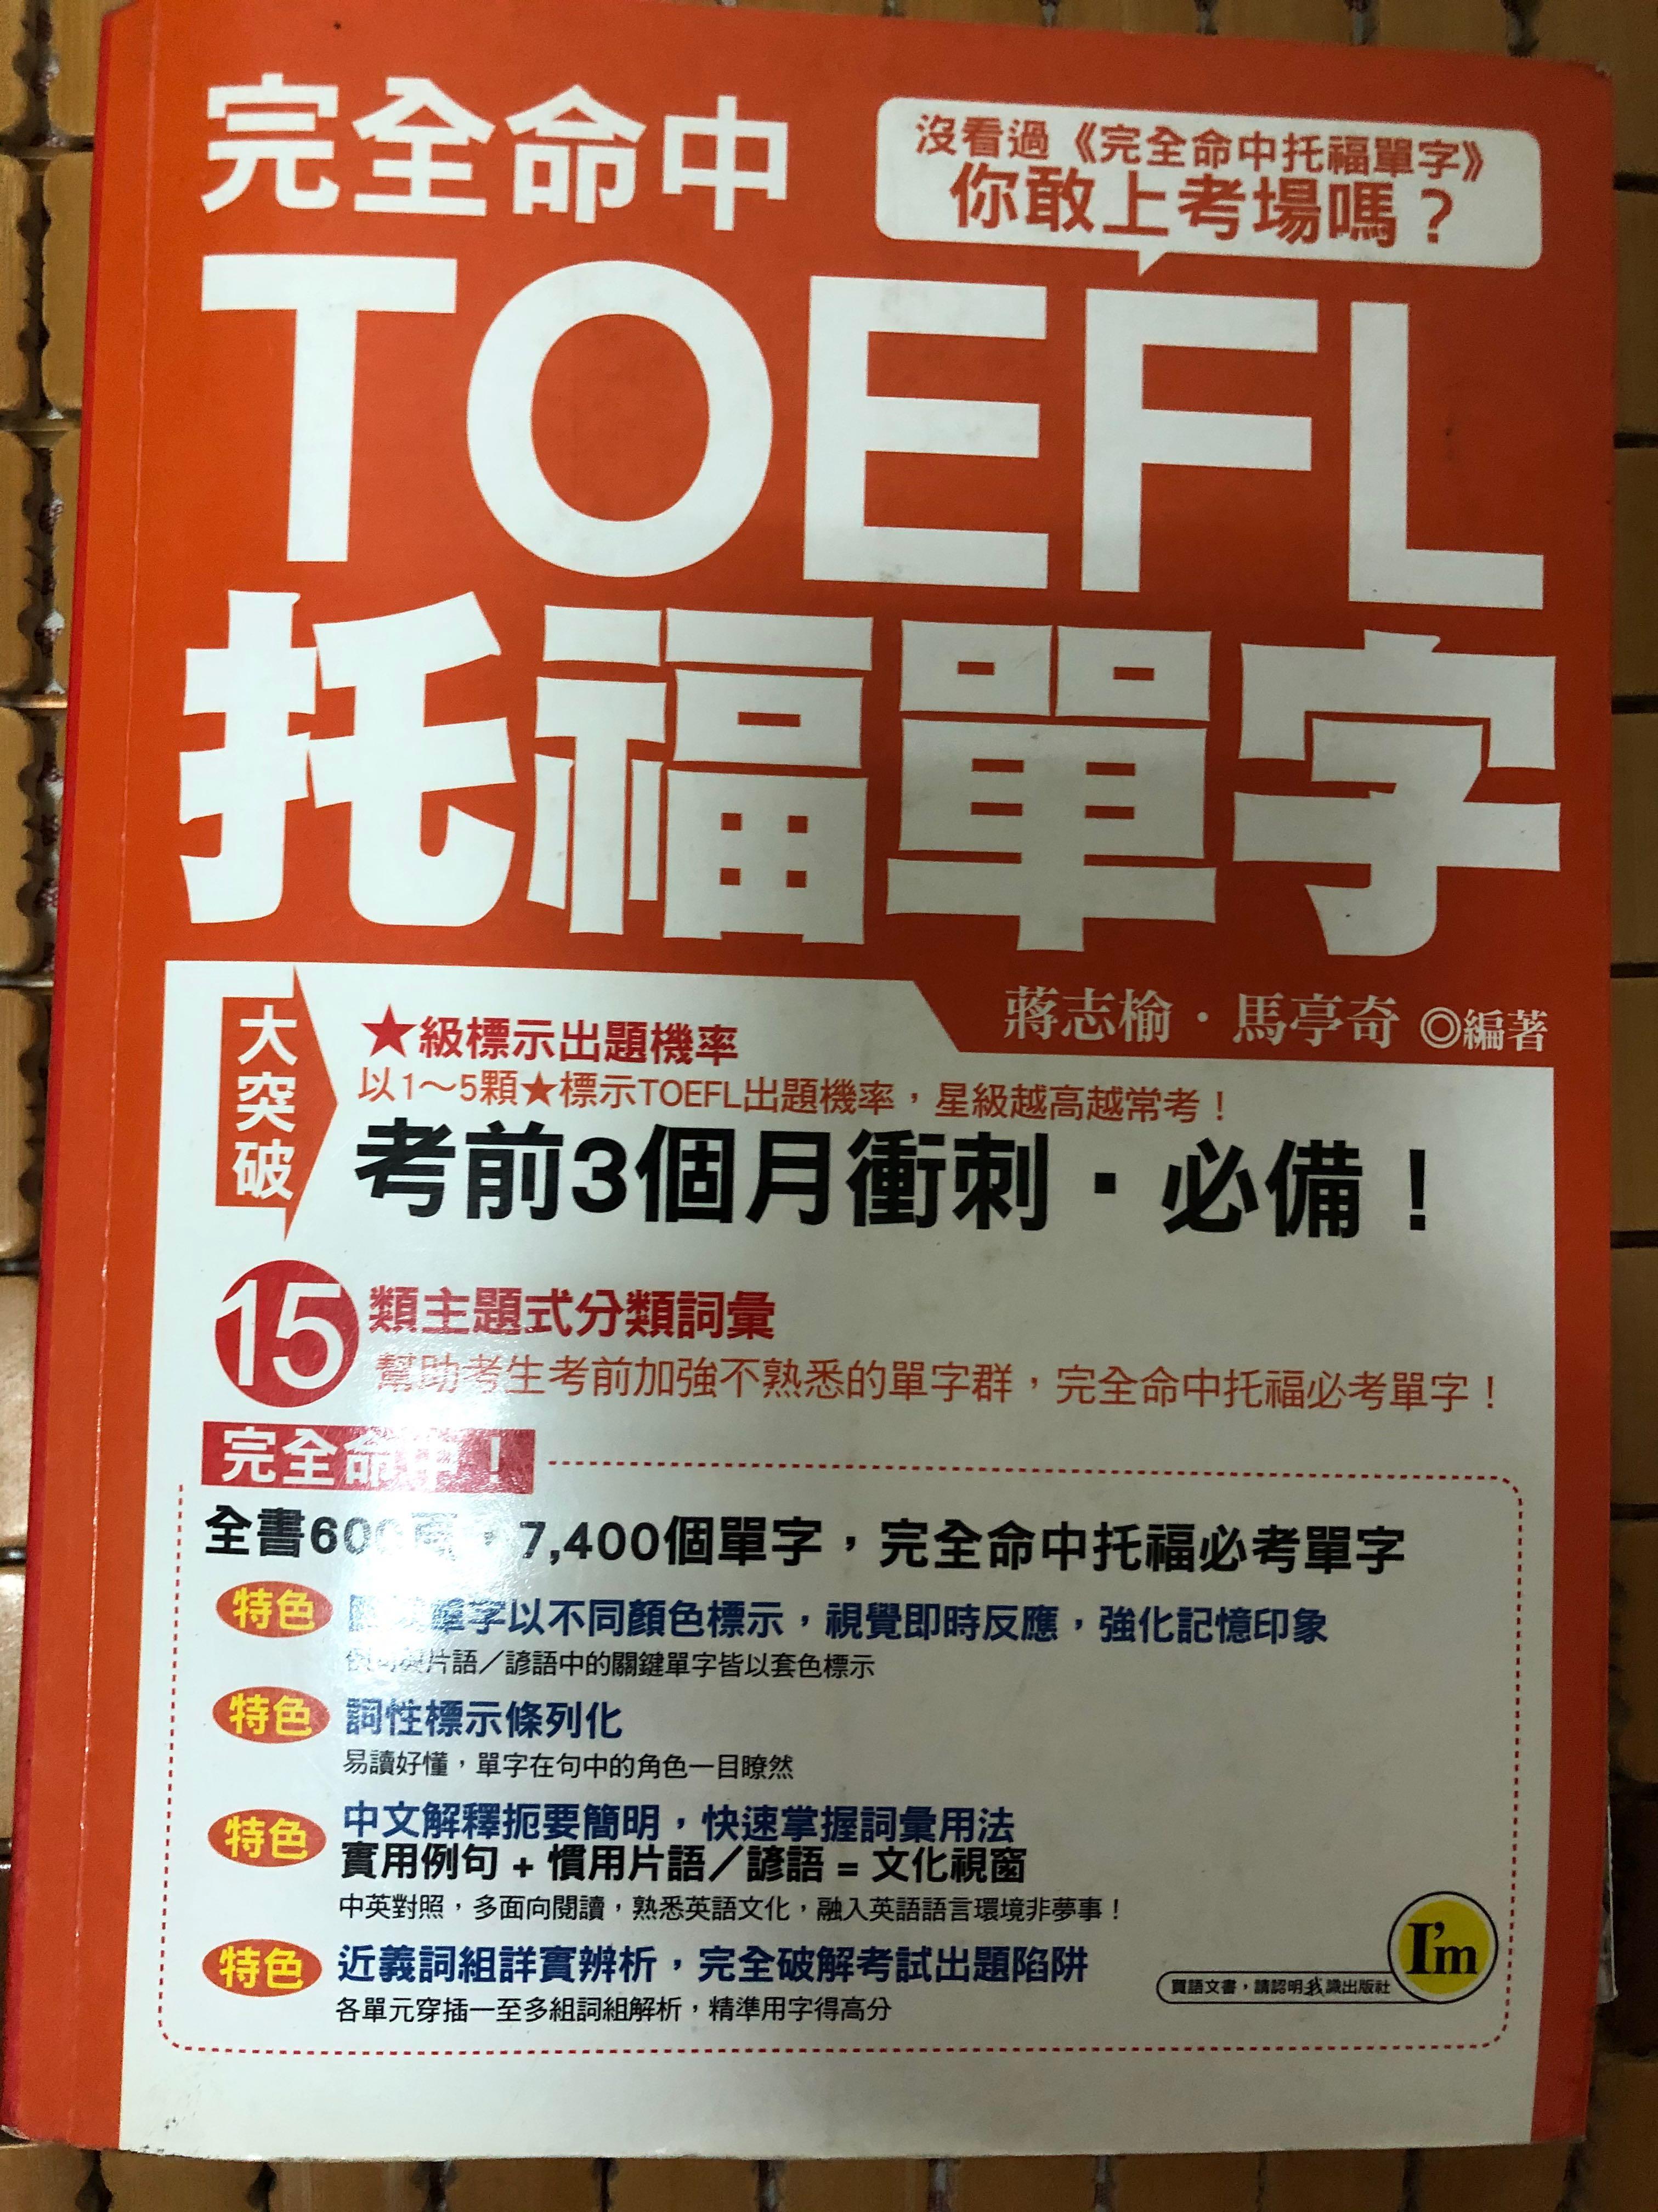 完全命中 TOFEL托福單字